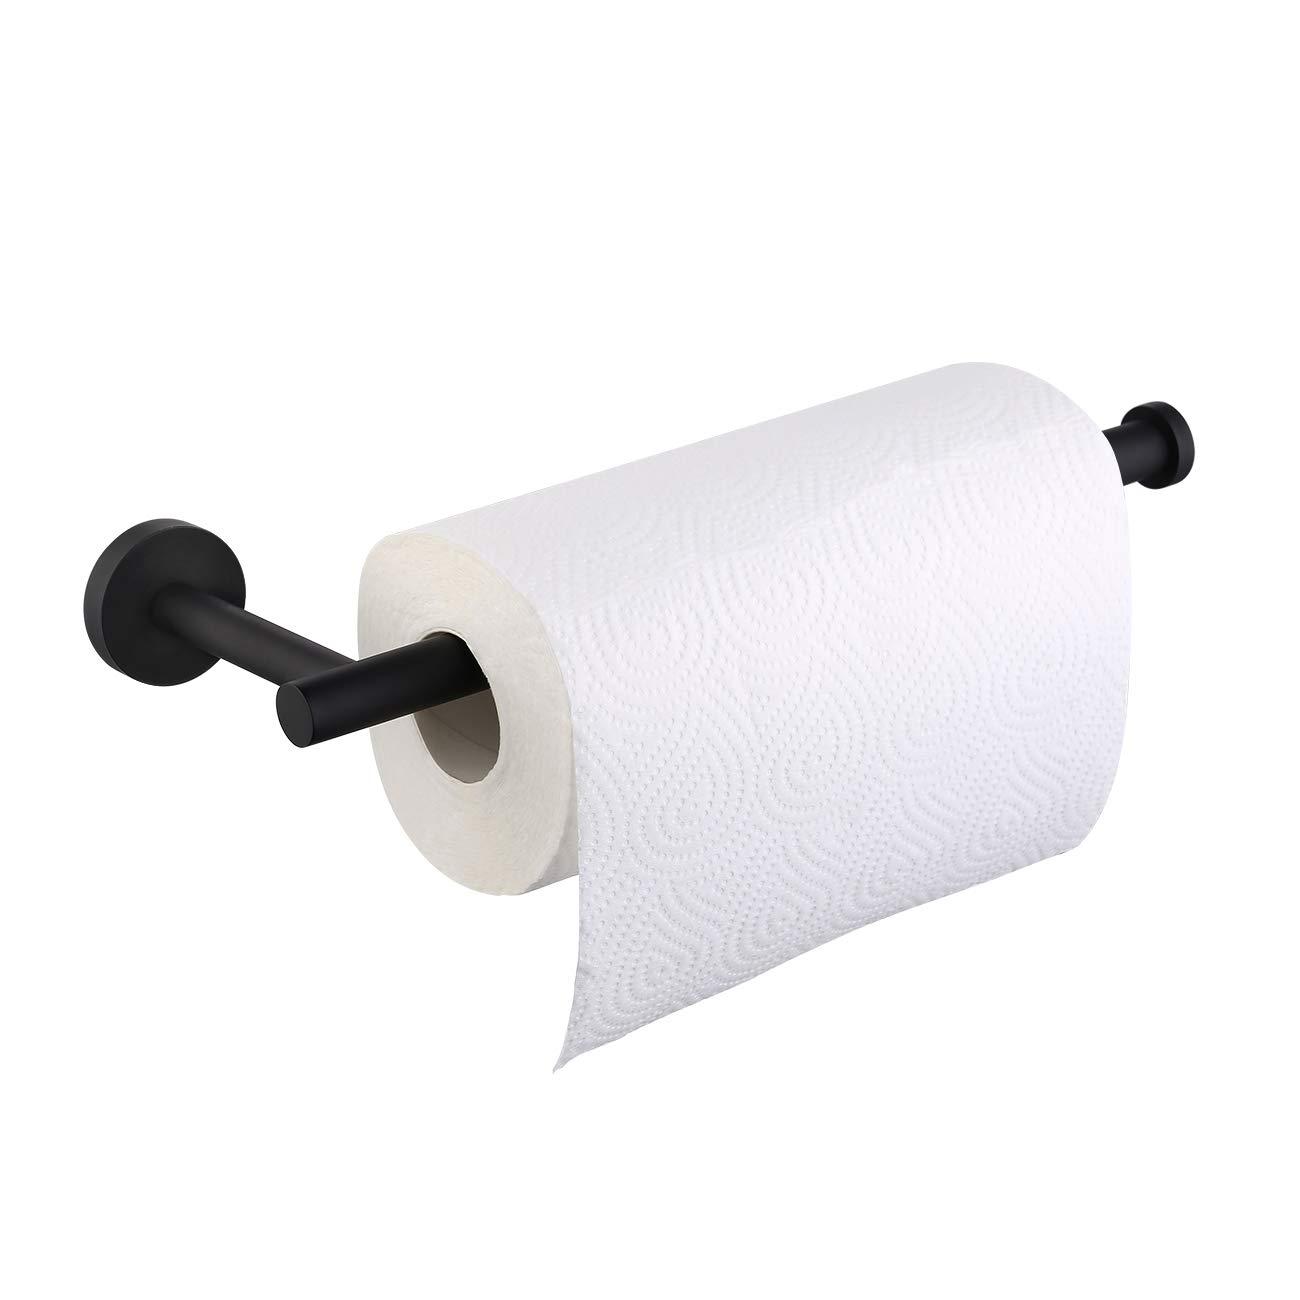 Kes Paper Towel Holder for Kitchen & Bathroom 11 Inch SUS 304 Stainless Steel Paper Towel Holder Dispenser Wall Mount/Under Cabinet Matte Black, A2175S30-BK